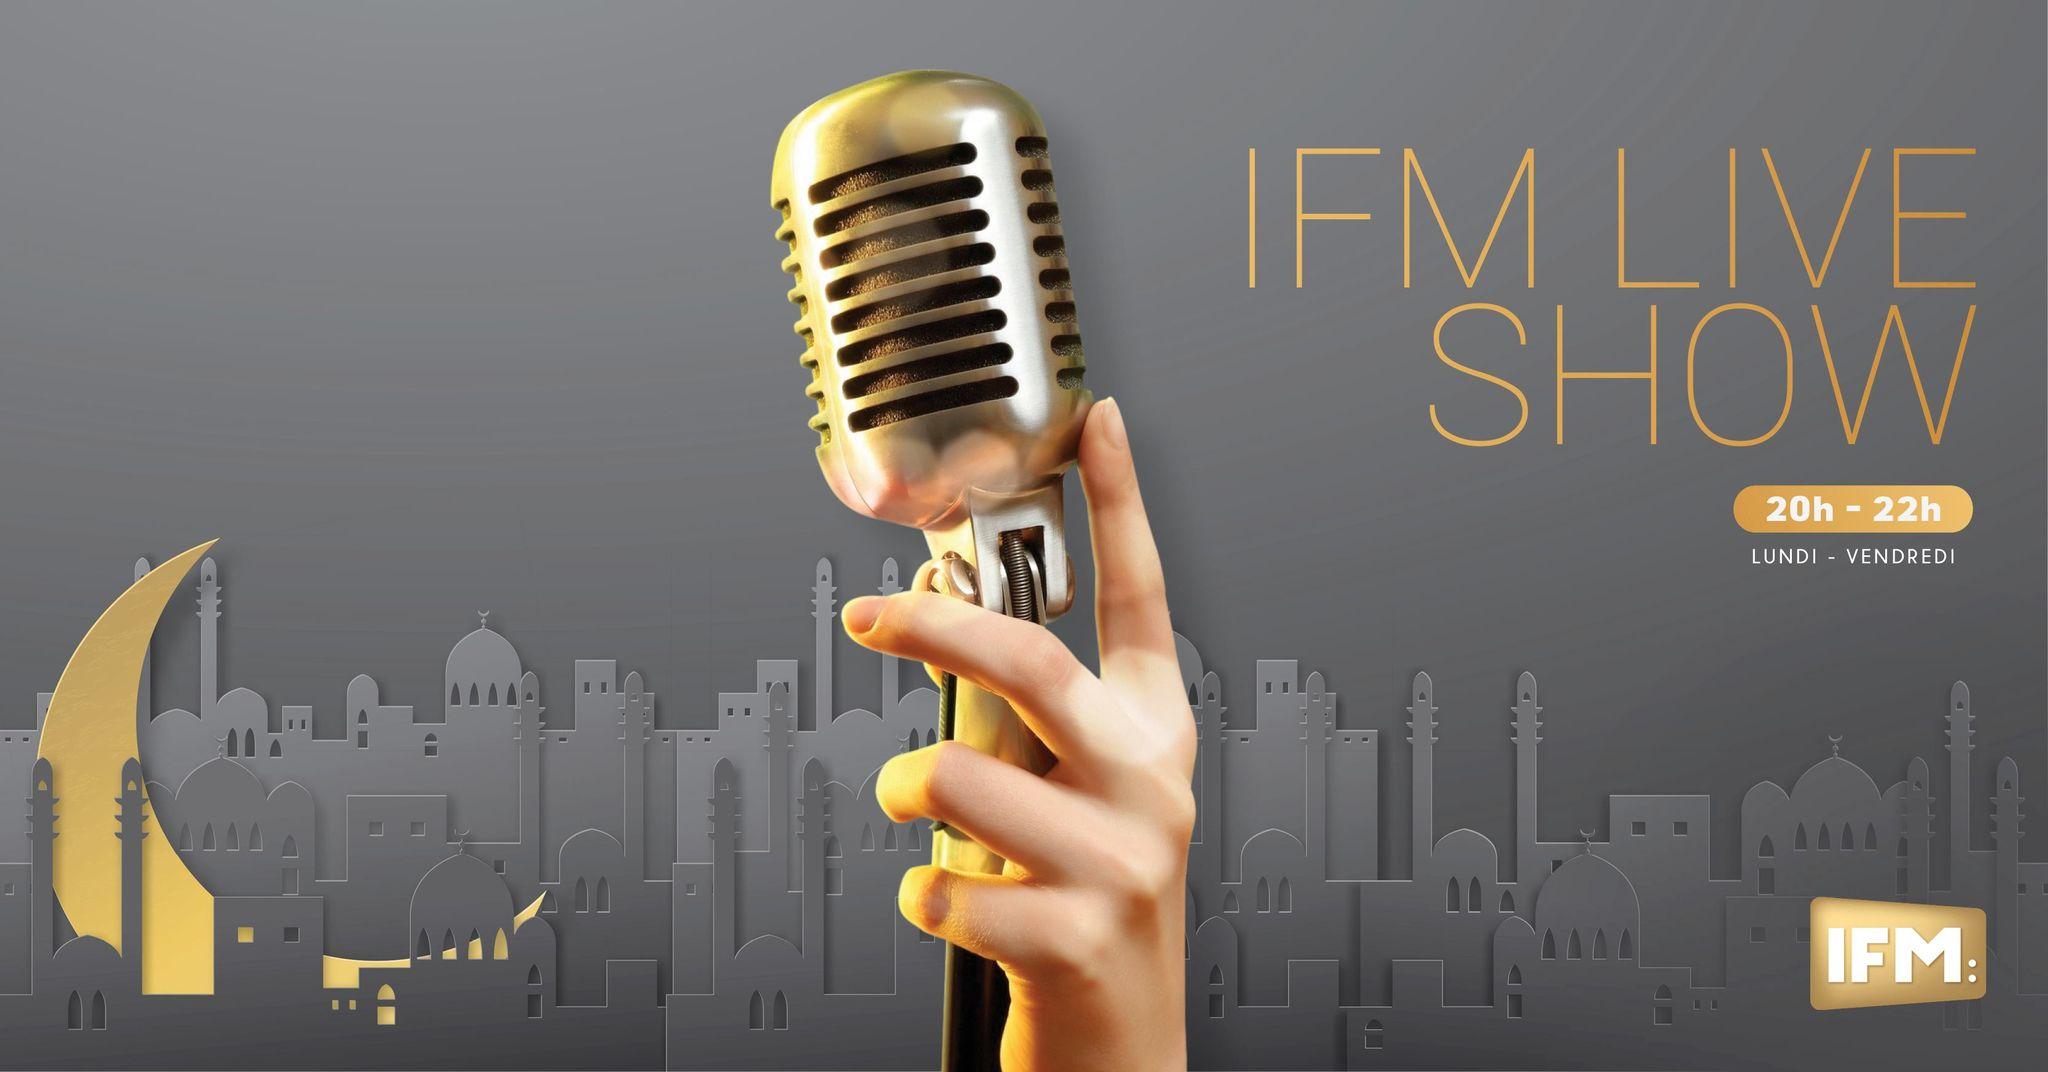 Ifm Live Show